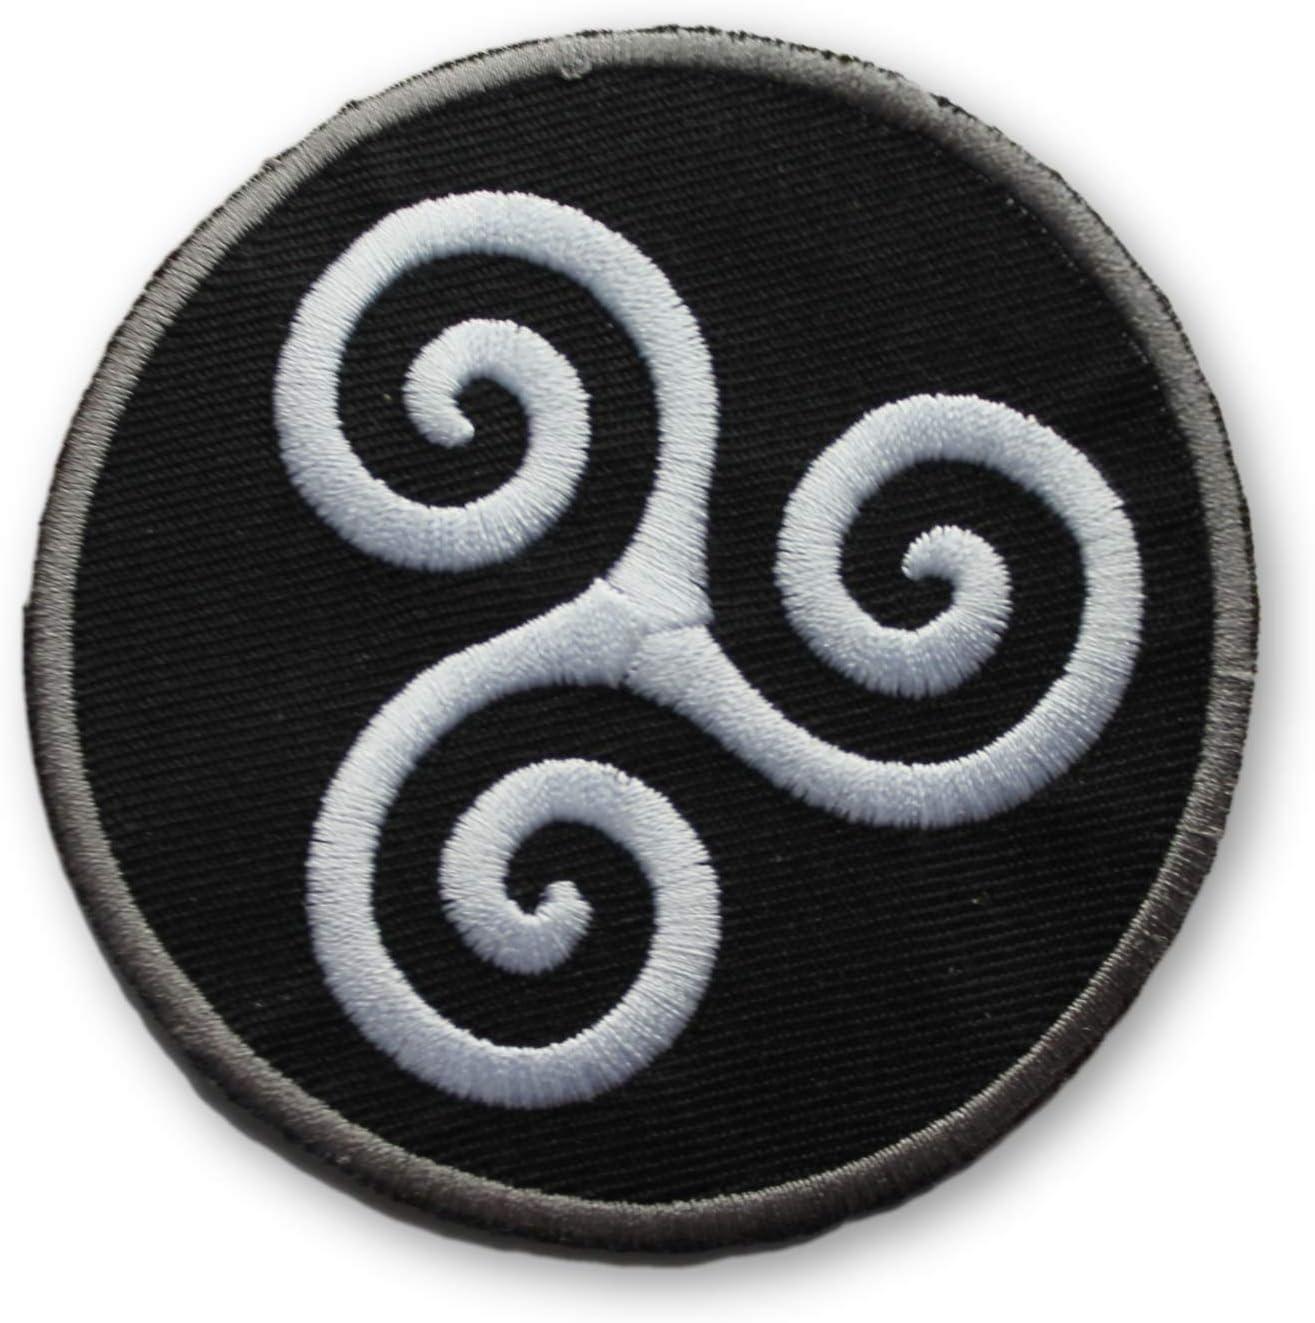 Tiss/écoud/ /Escudo Celta Triskell Breta/ña Cruz Celta Breizh Patch Bordado